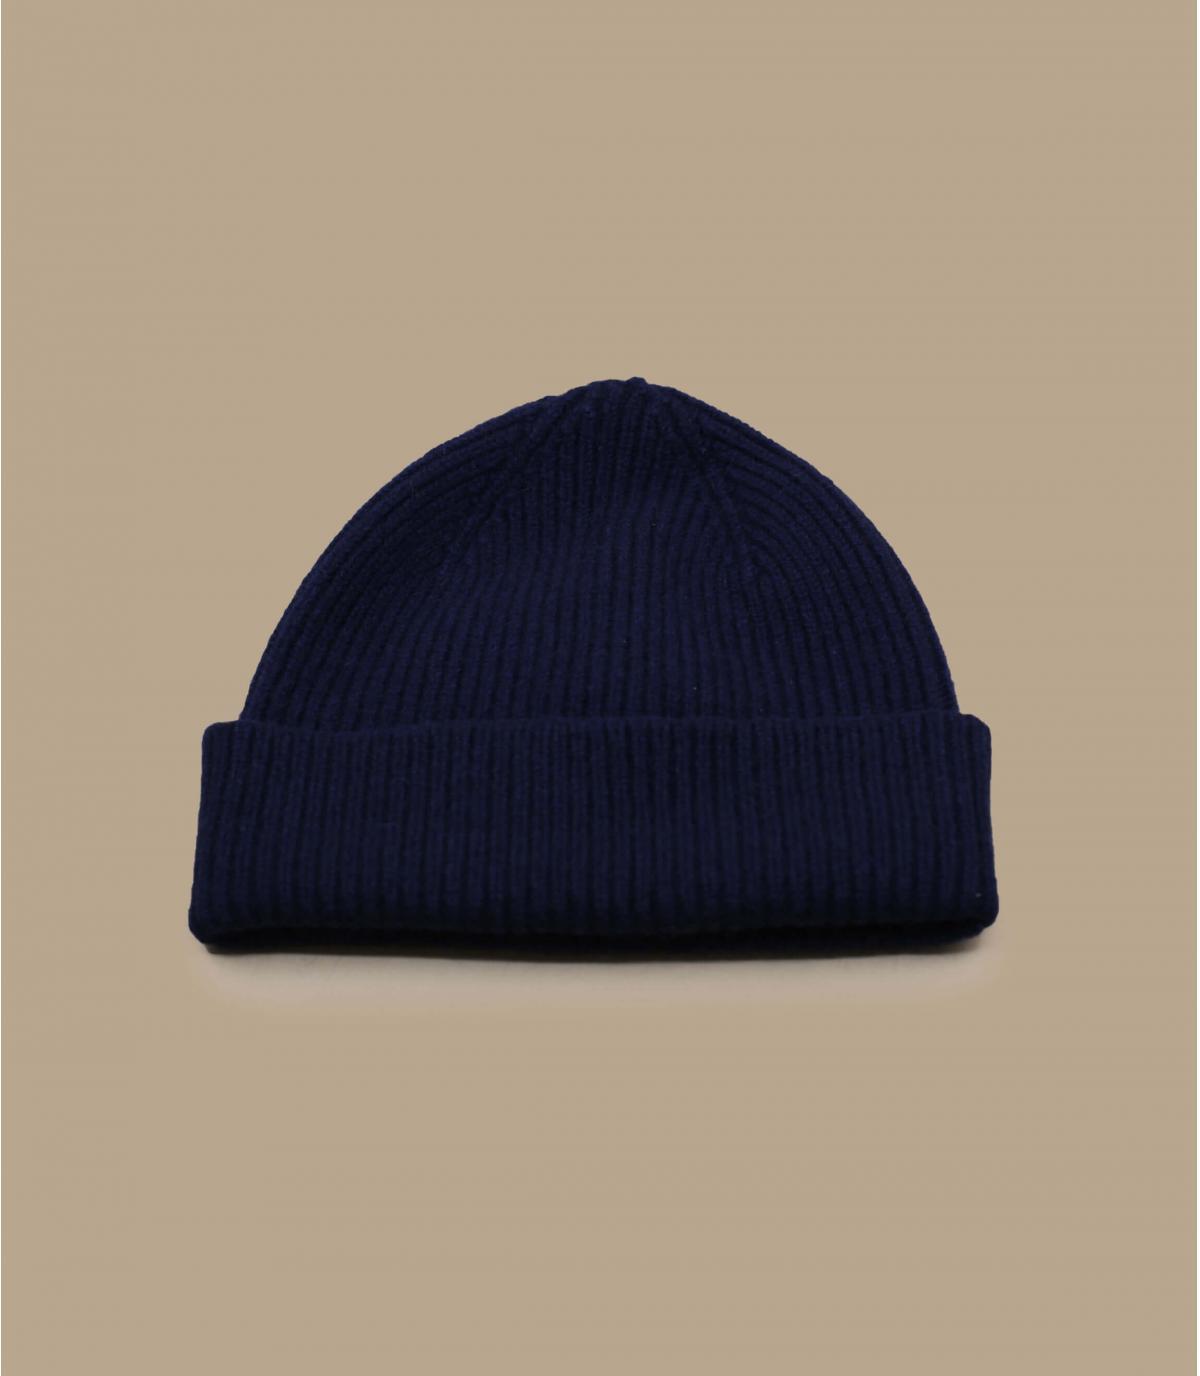 navy blue cuffed beanie wool angora